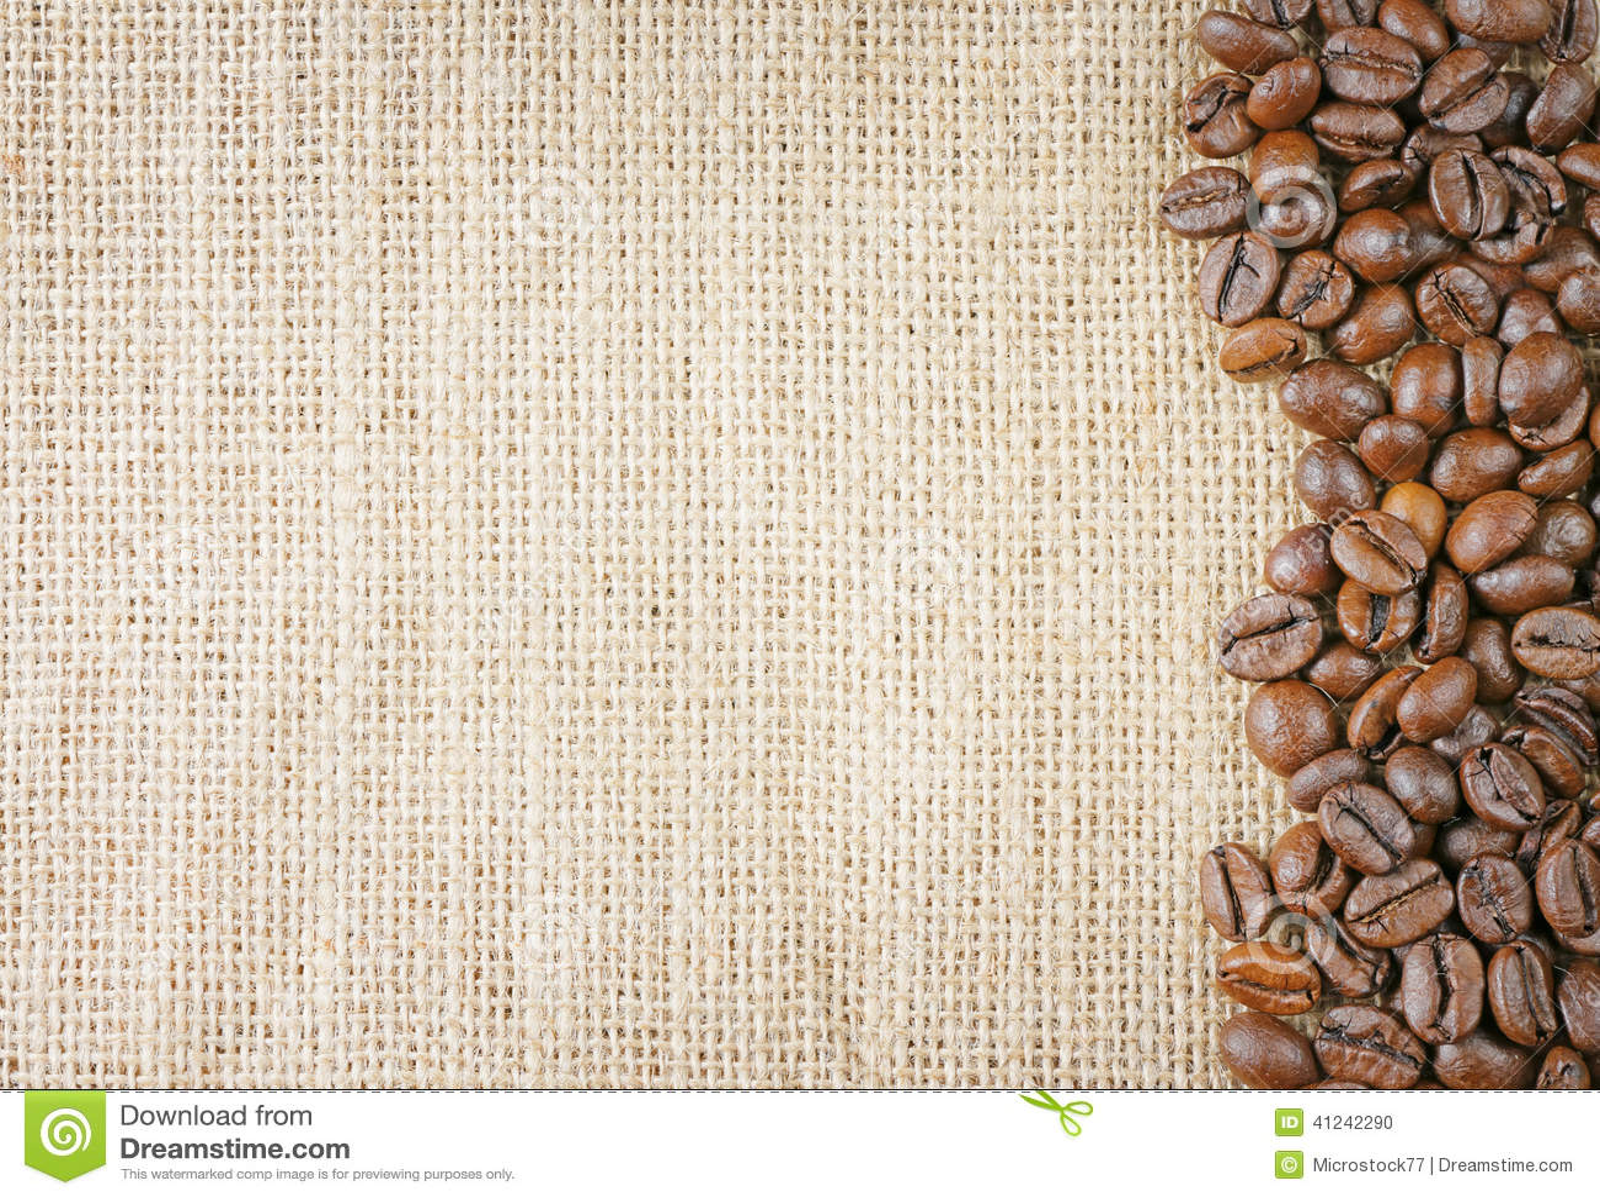 Coffee Beans Juta Stock Photo Image 41242290